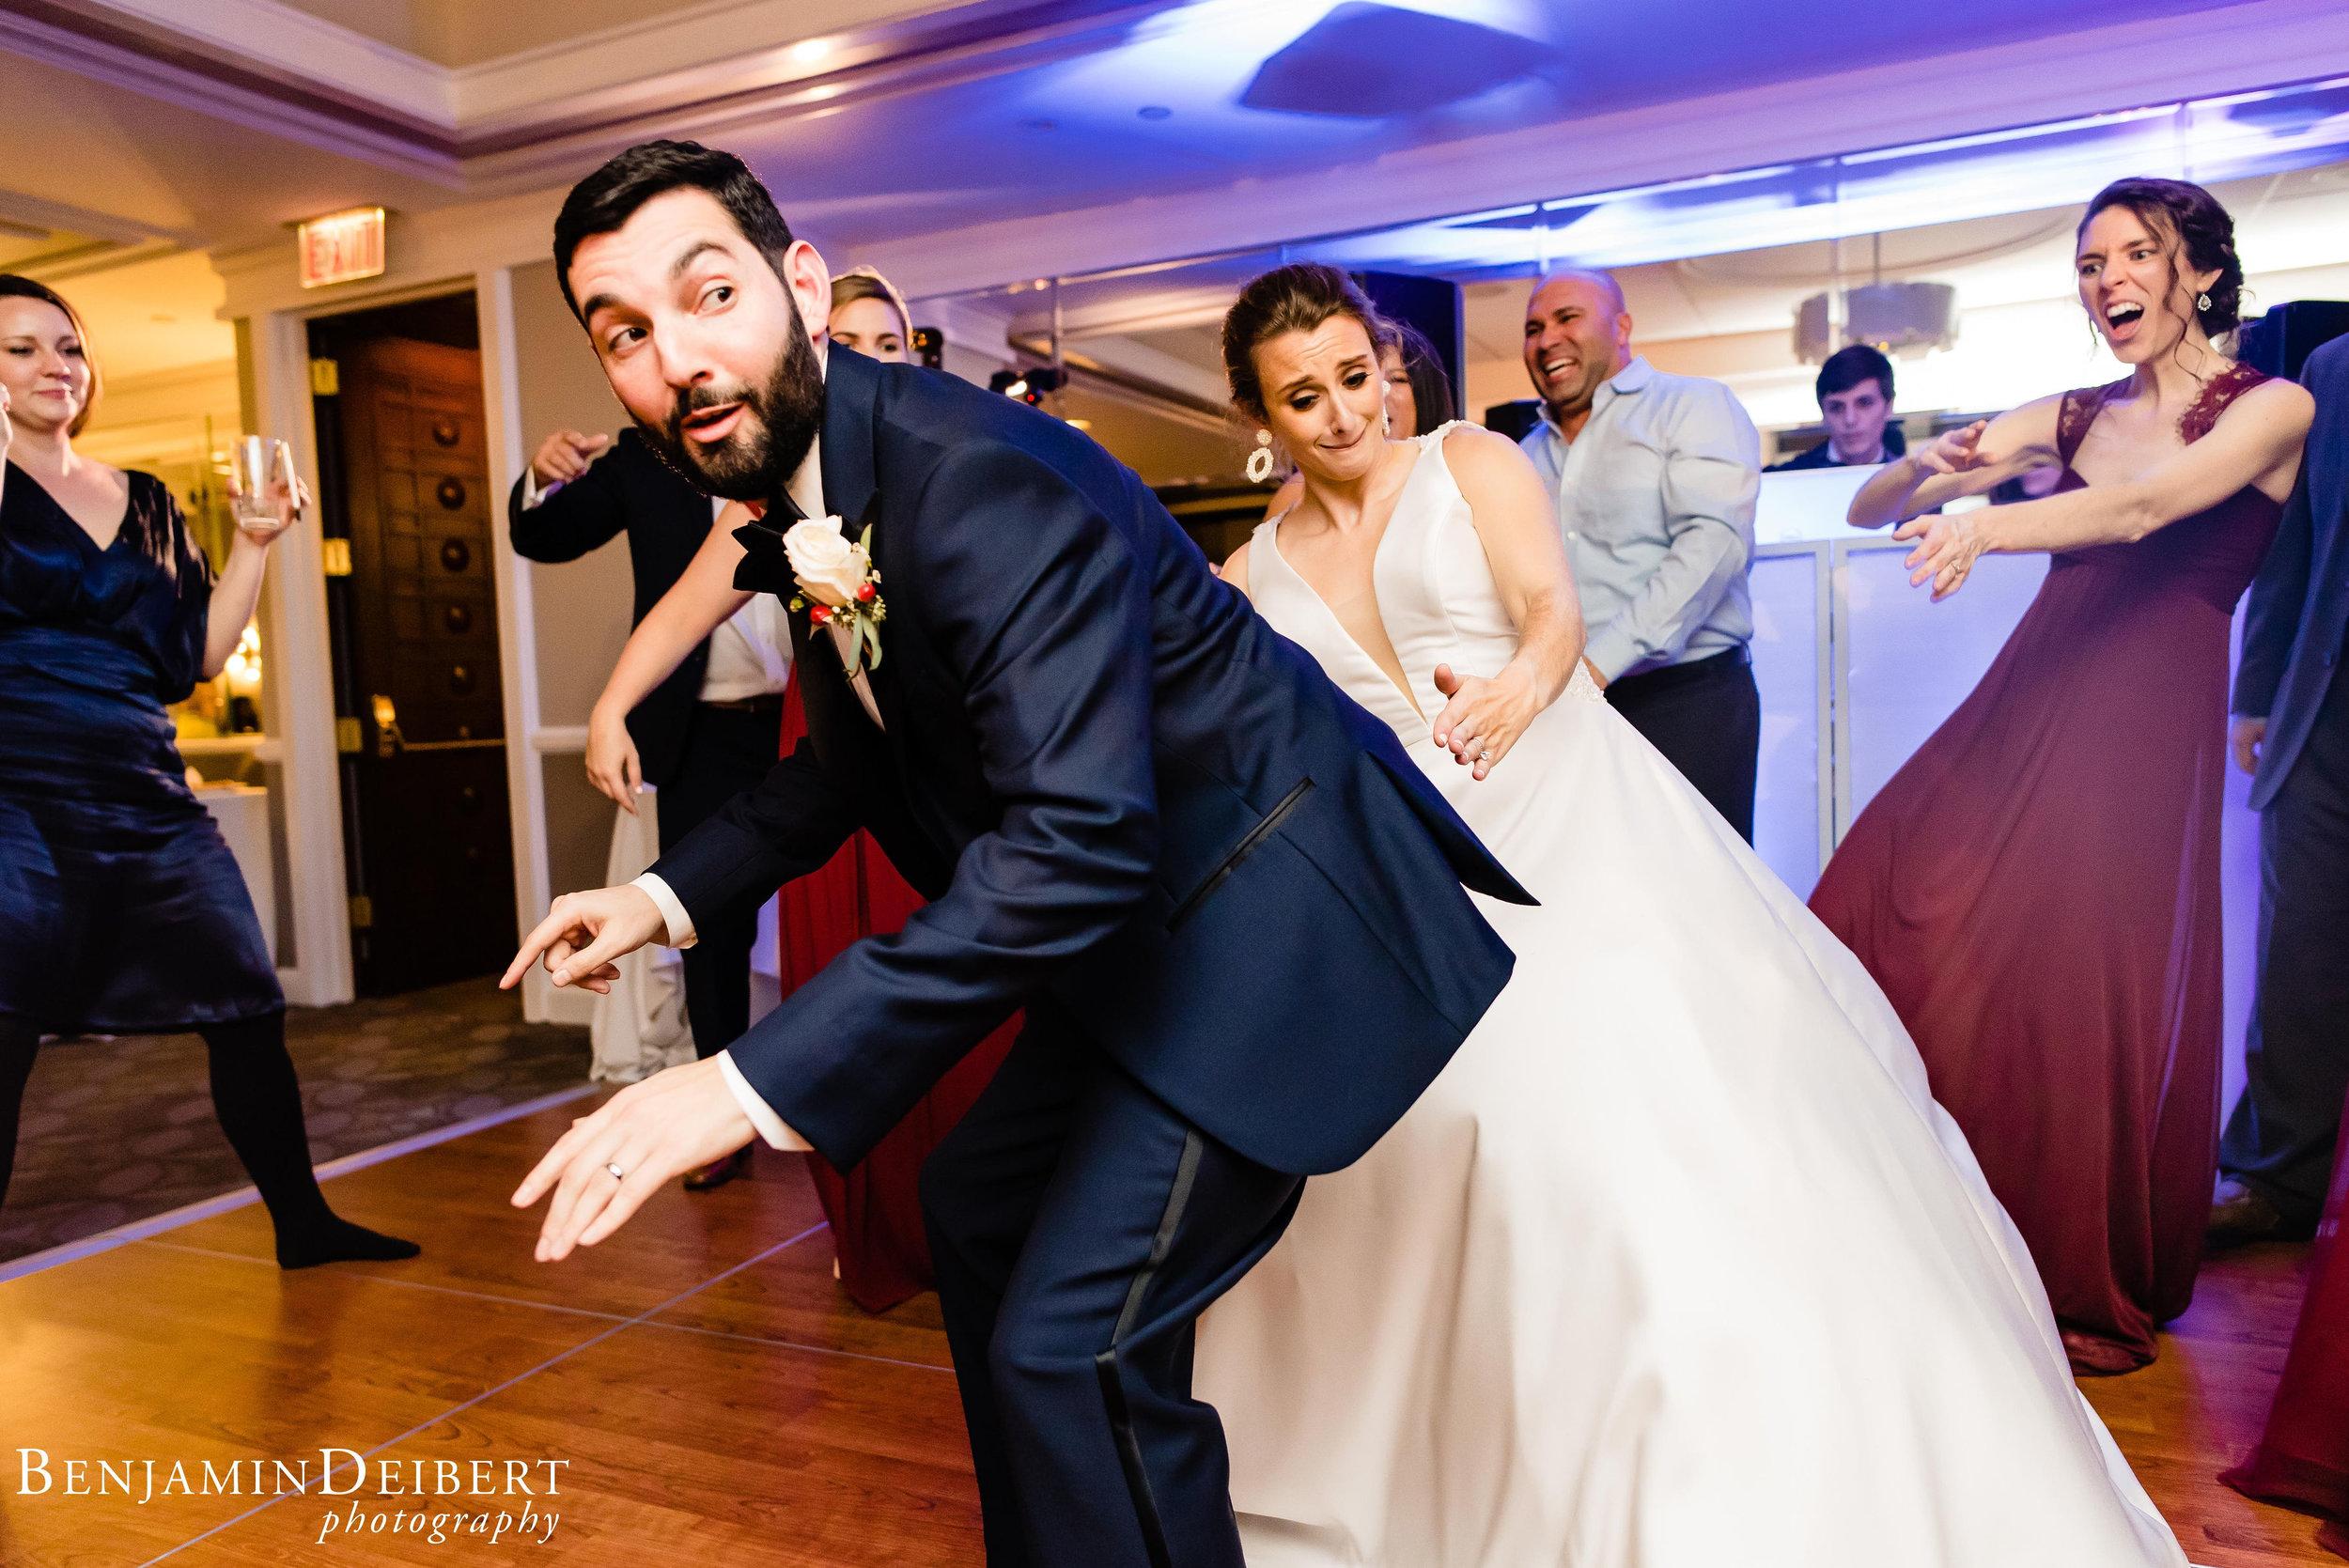 CatherineandDaniel_ThePyramidClub_Wedding-84.jpg